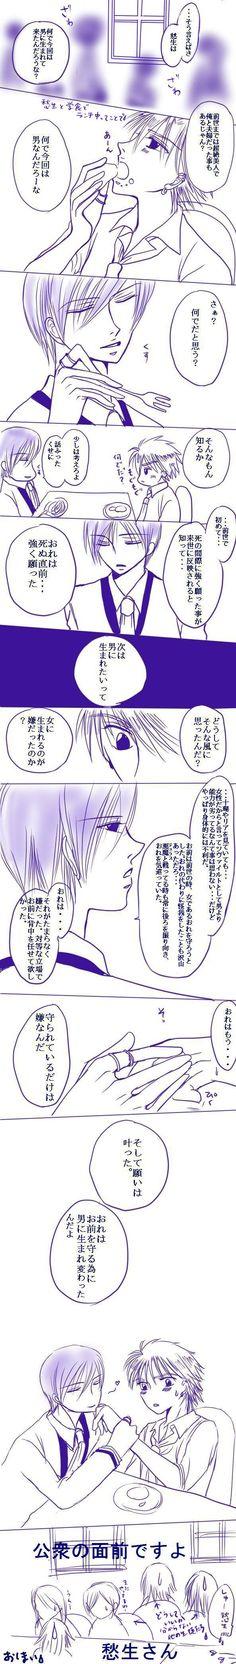 Eating together ...  betrayal knows my name, hotsuma renjou, shūsei usui, uraboku, uragiri